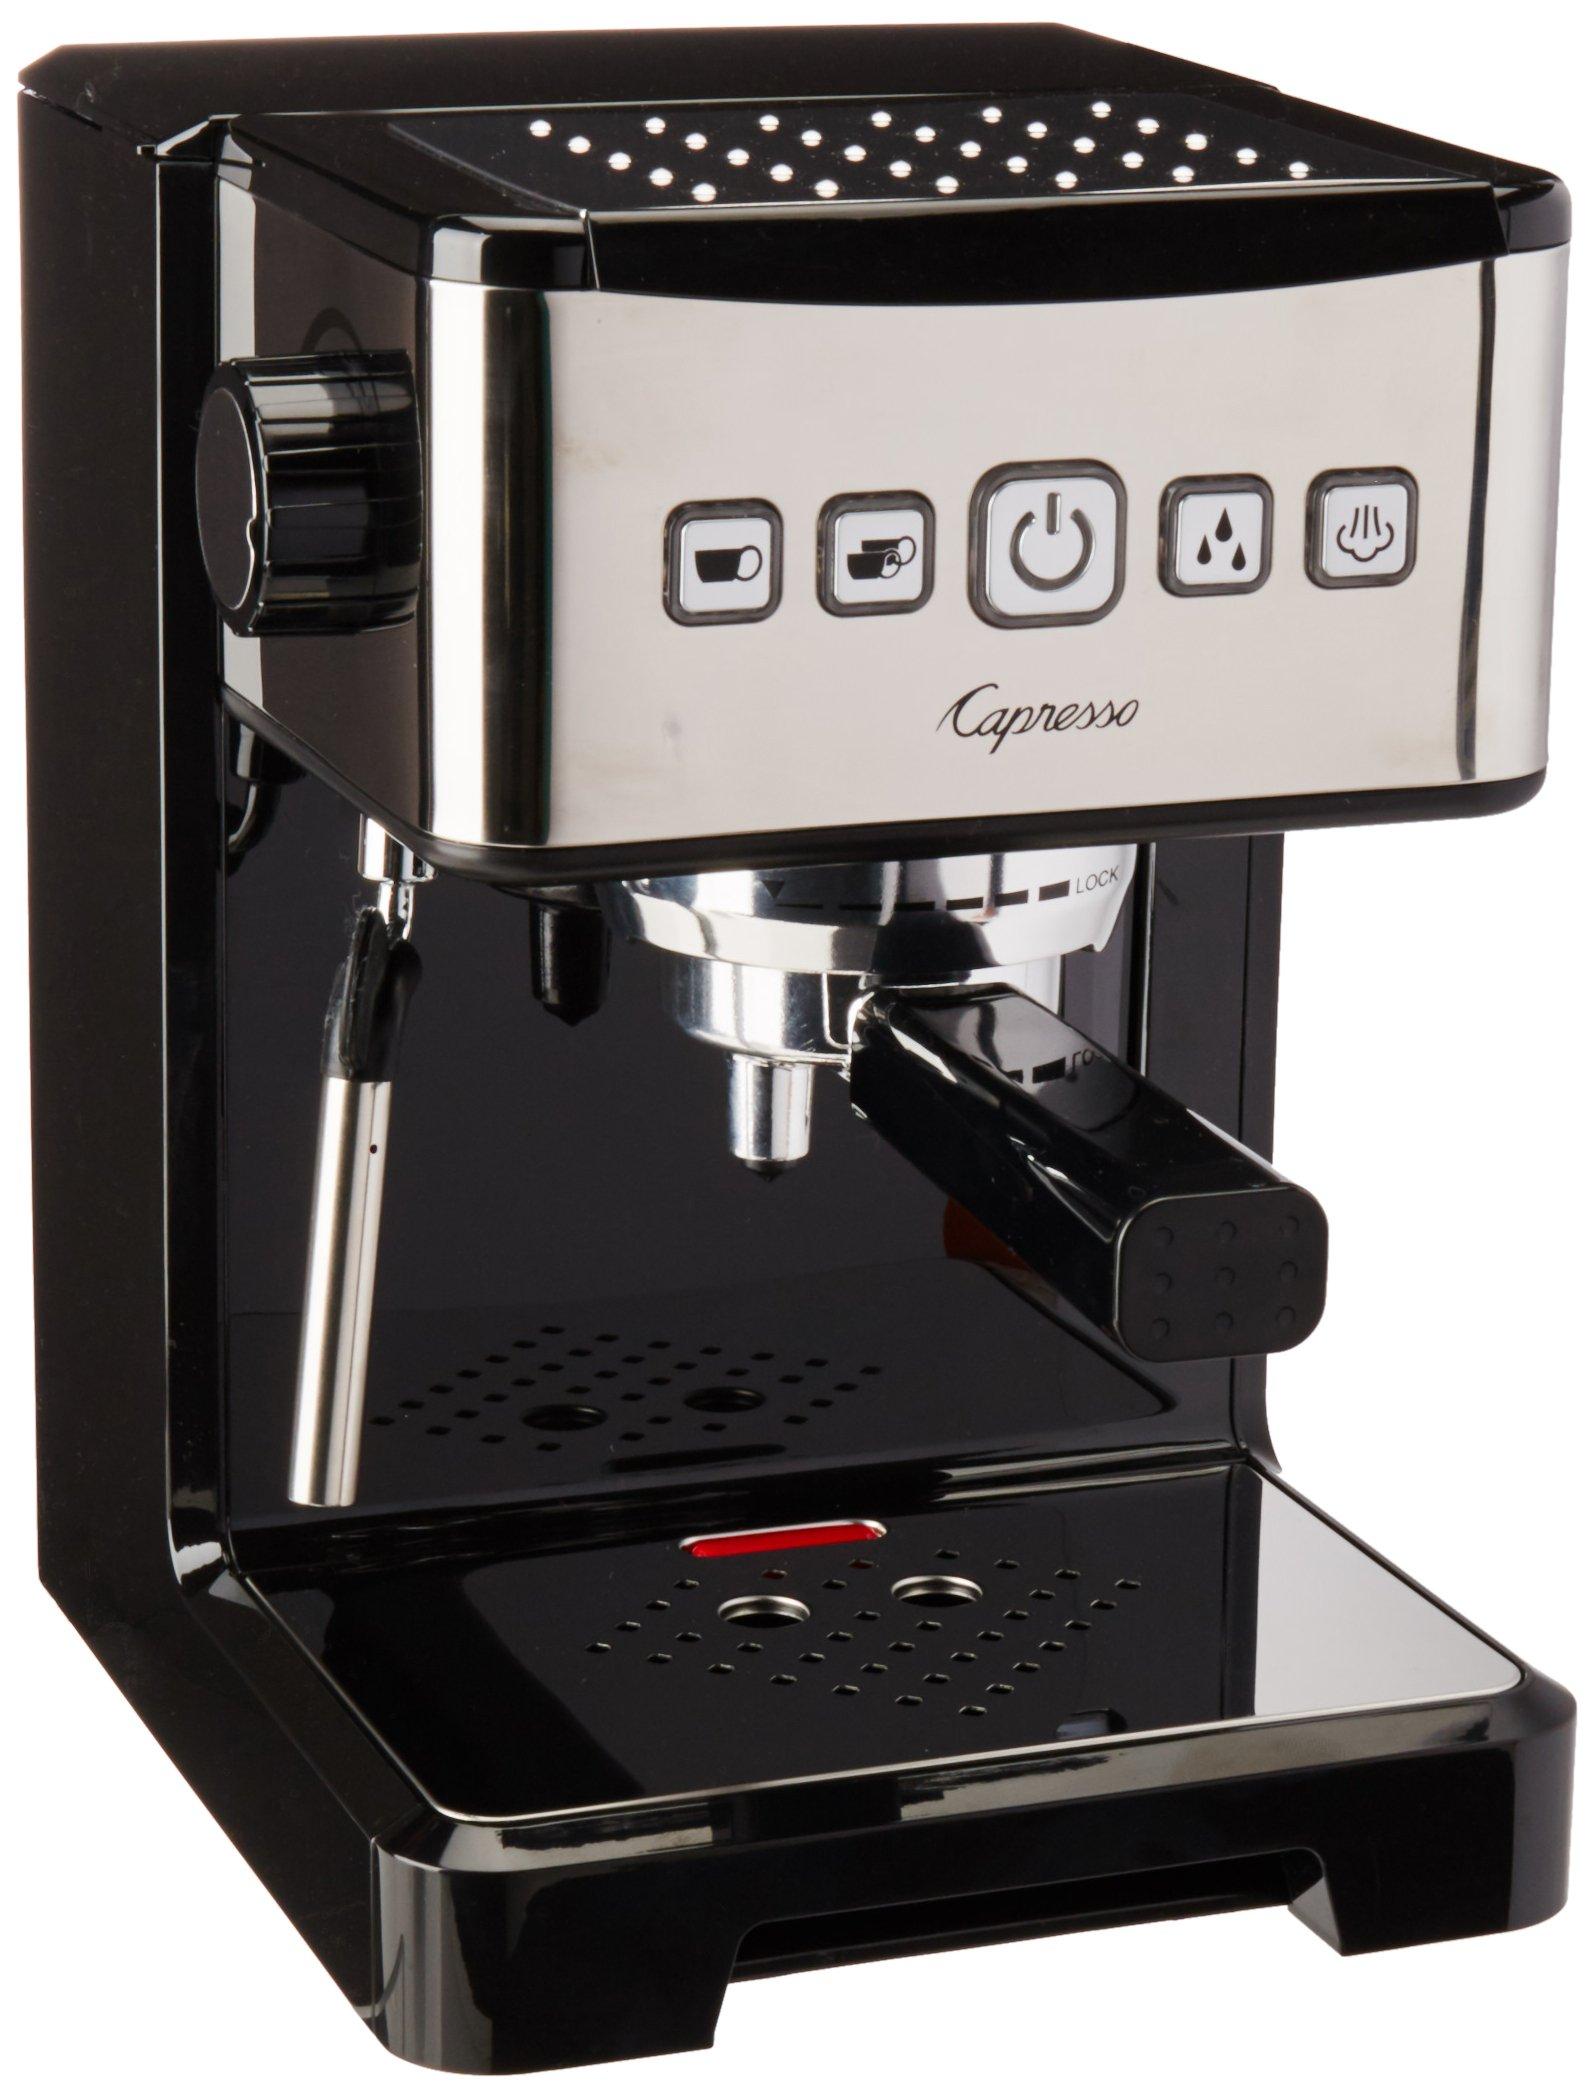 Capresso 124.01 Ultima Pro Espresso Machine Coffeemaker, Black/Stainless by Capresso (Image #1)